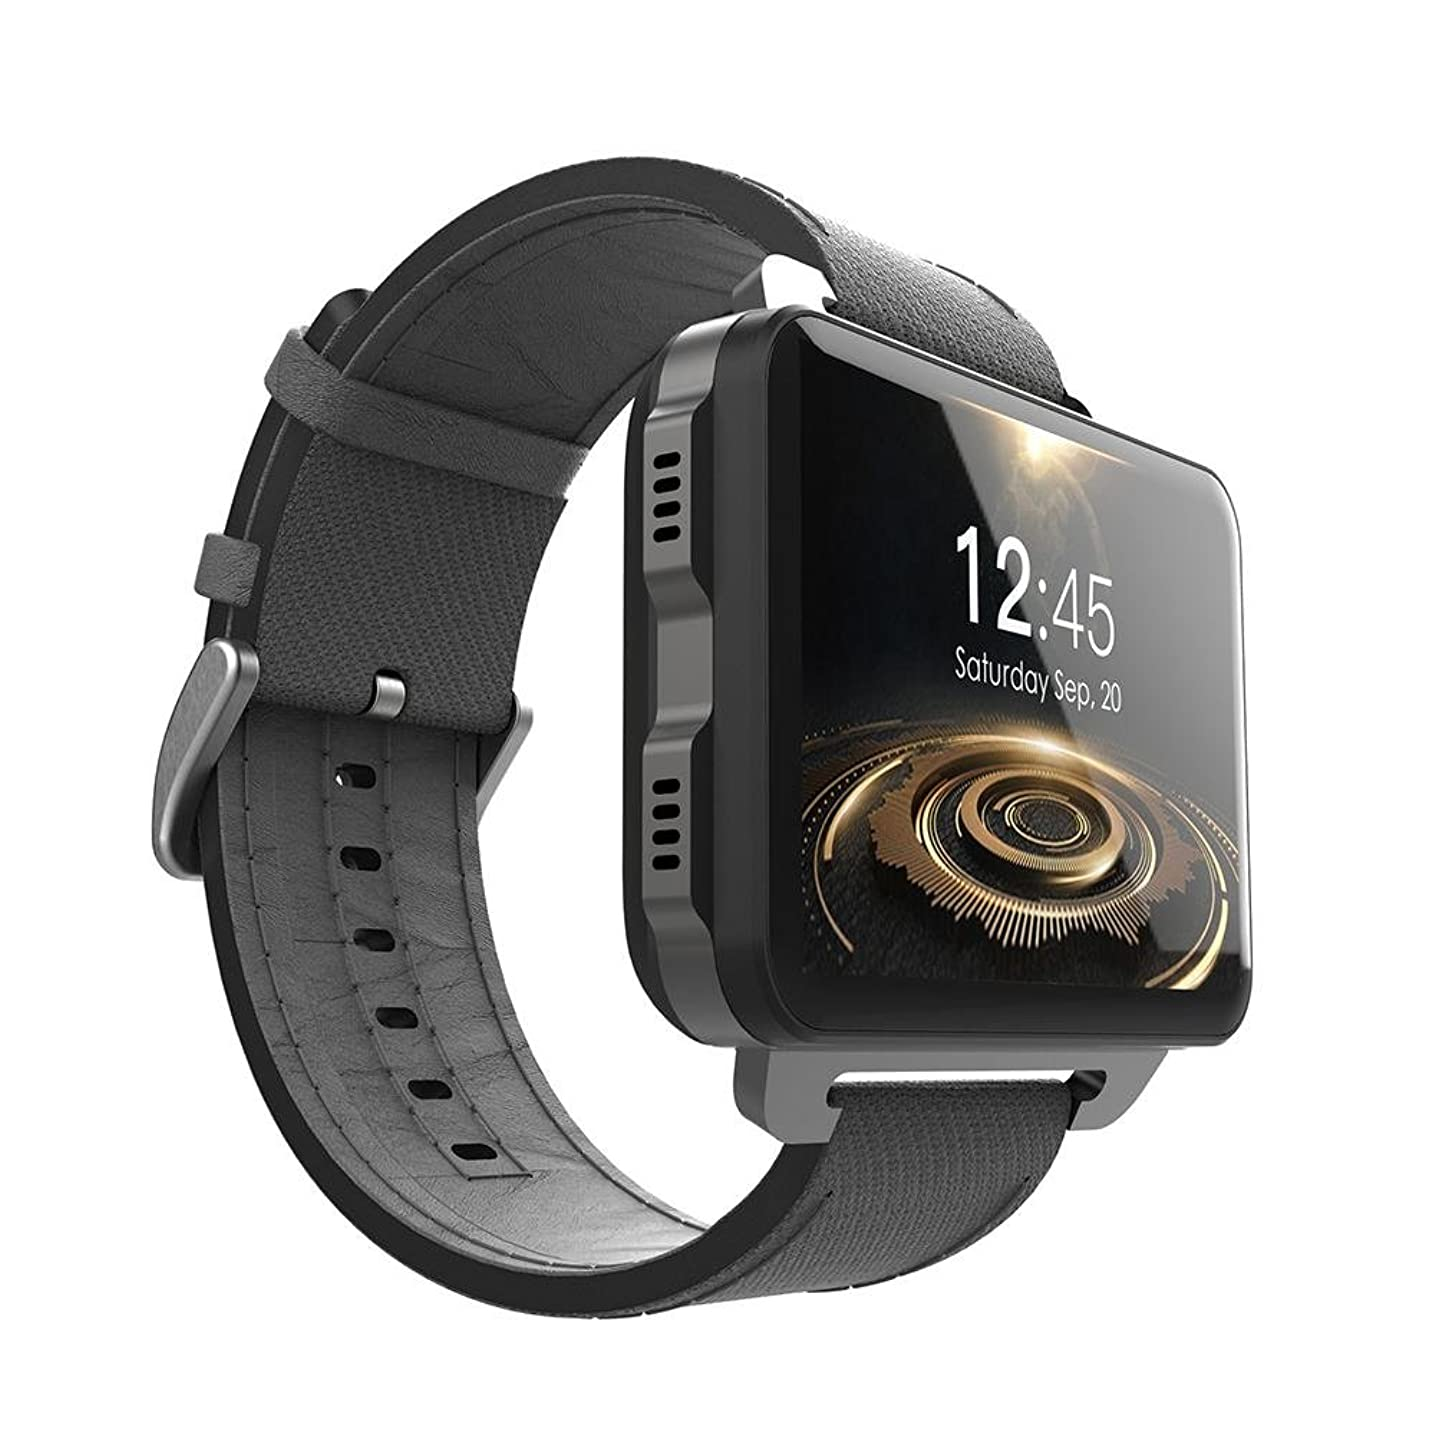 Genekun Smart Fitness Watch Browser Heart Rate Monitoring DM99 Large Color Screen 3G 1RAM+16ROM